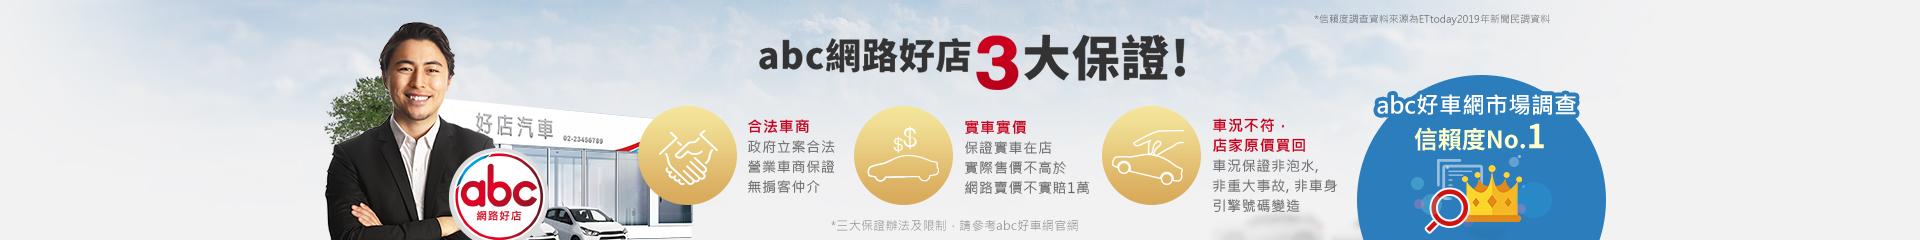 abc網路好店3大保證 合法車商|時價登入|車況不服,店家原價買回